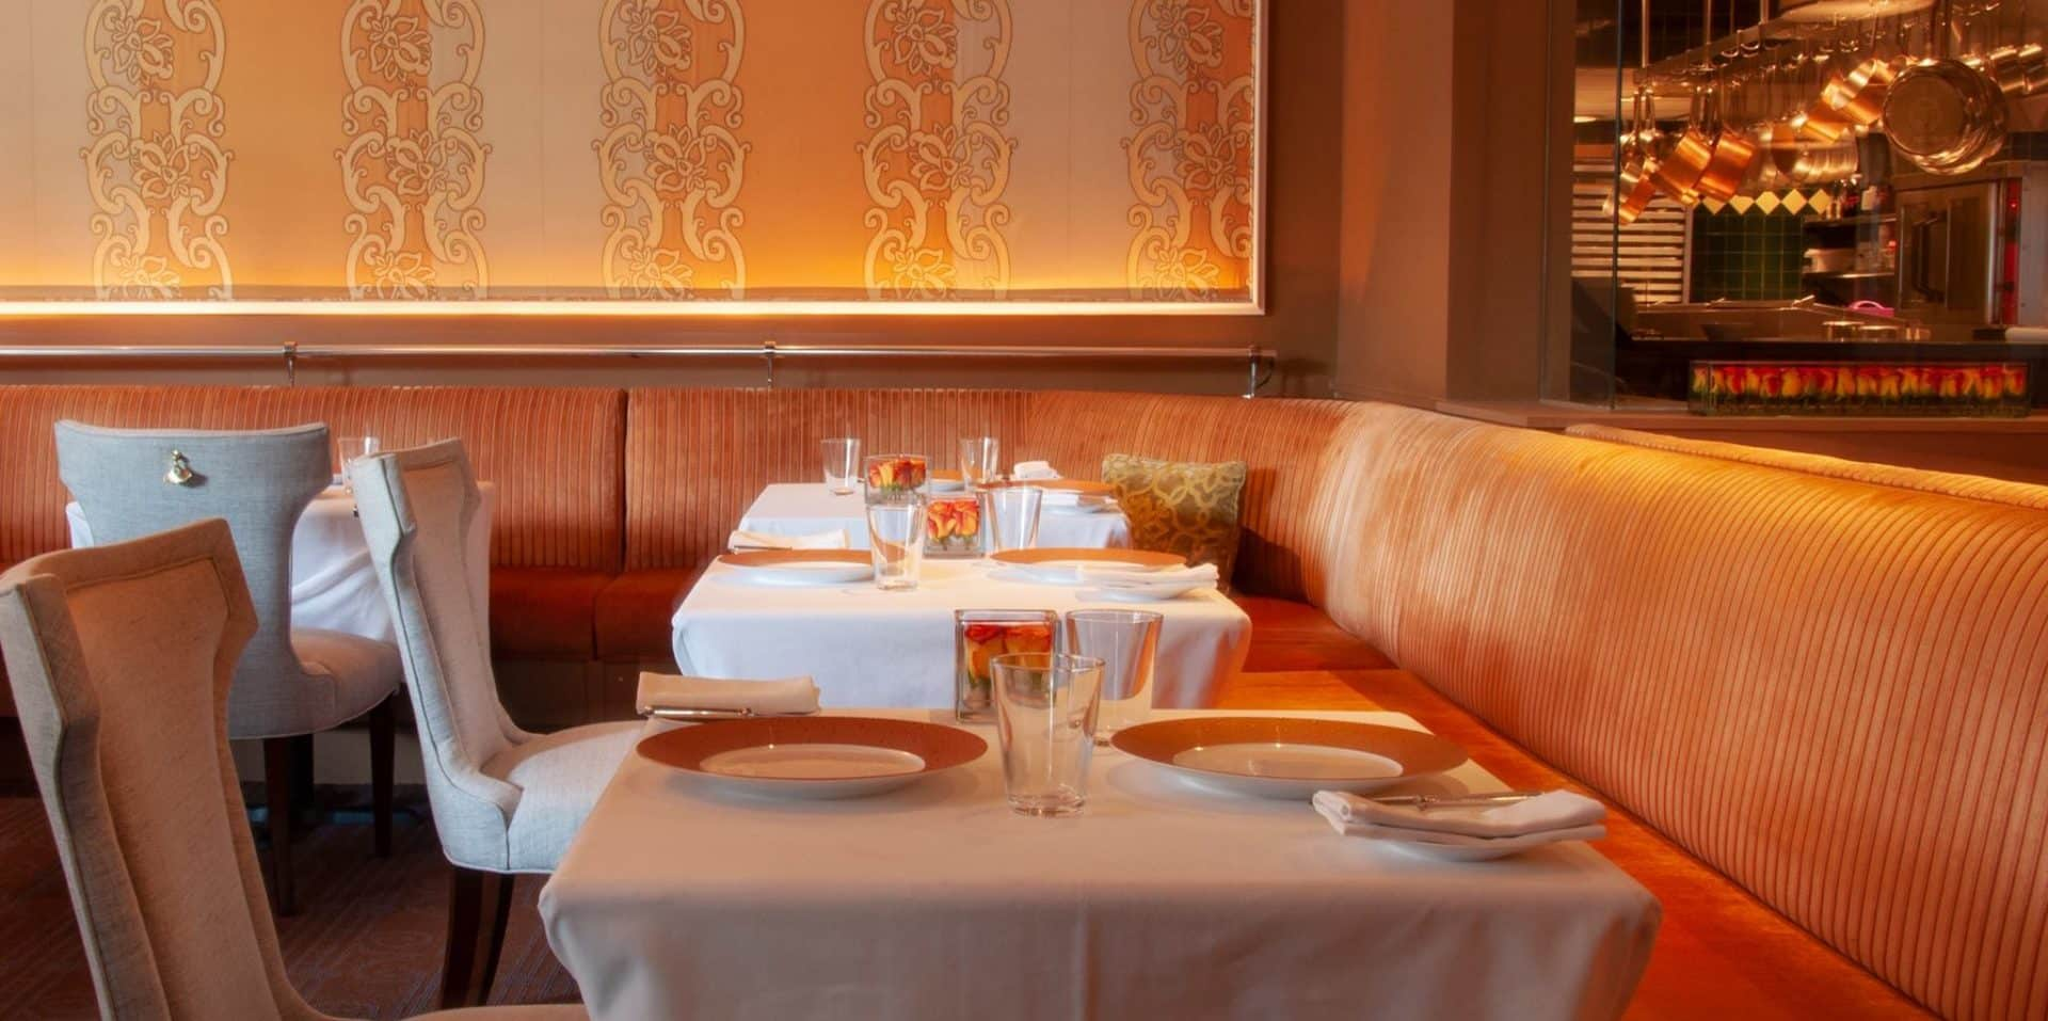 Baltimore's Most Romantic Restaurants